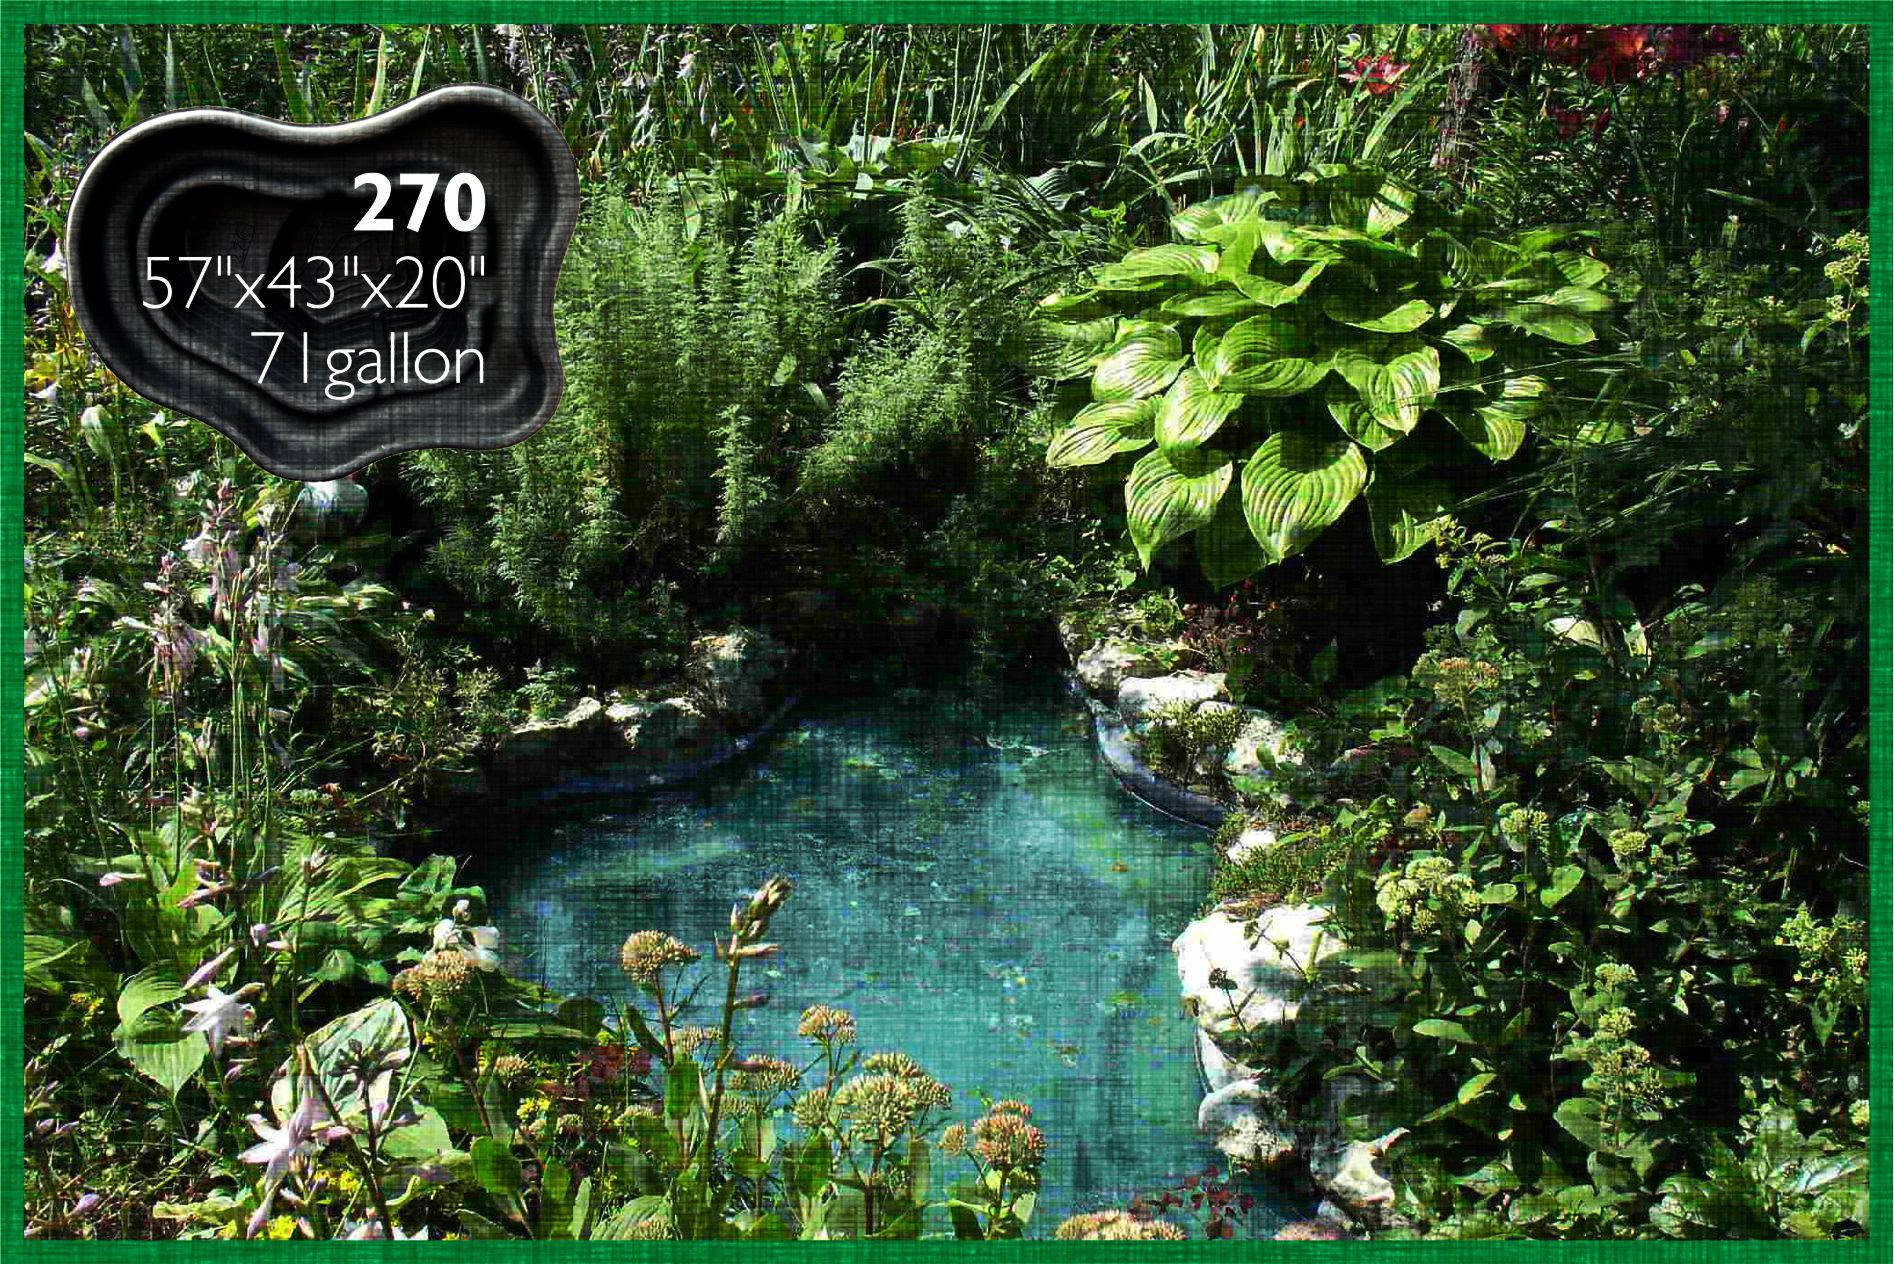 Pond 270